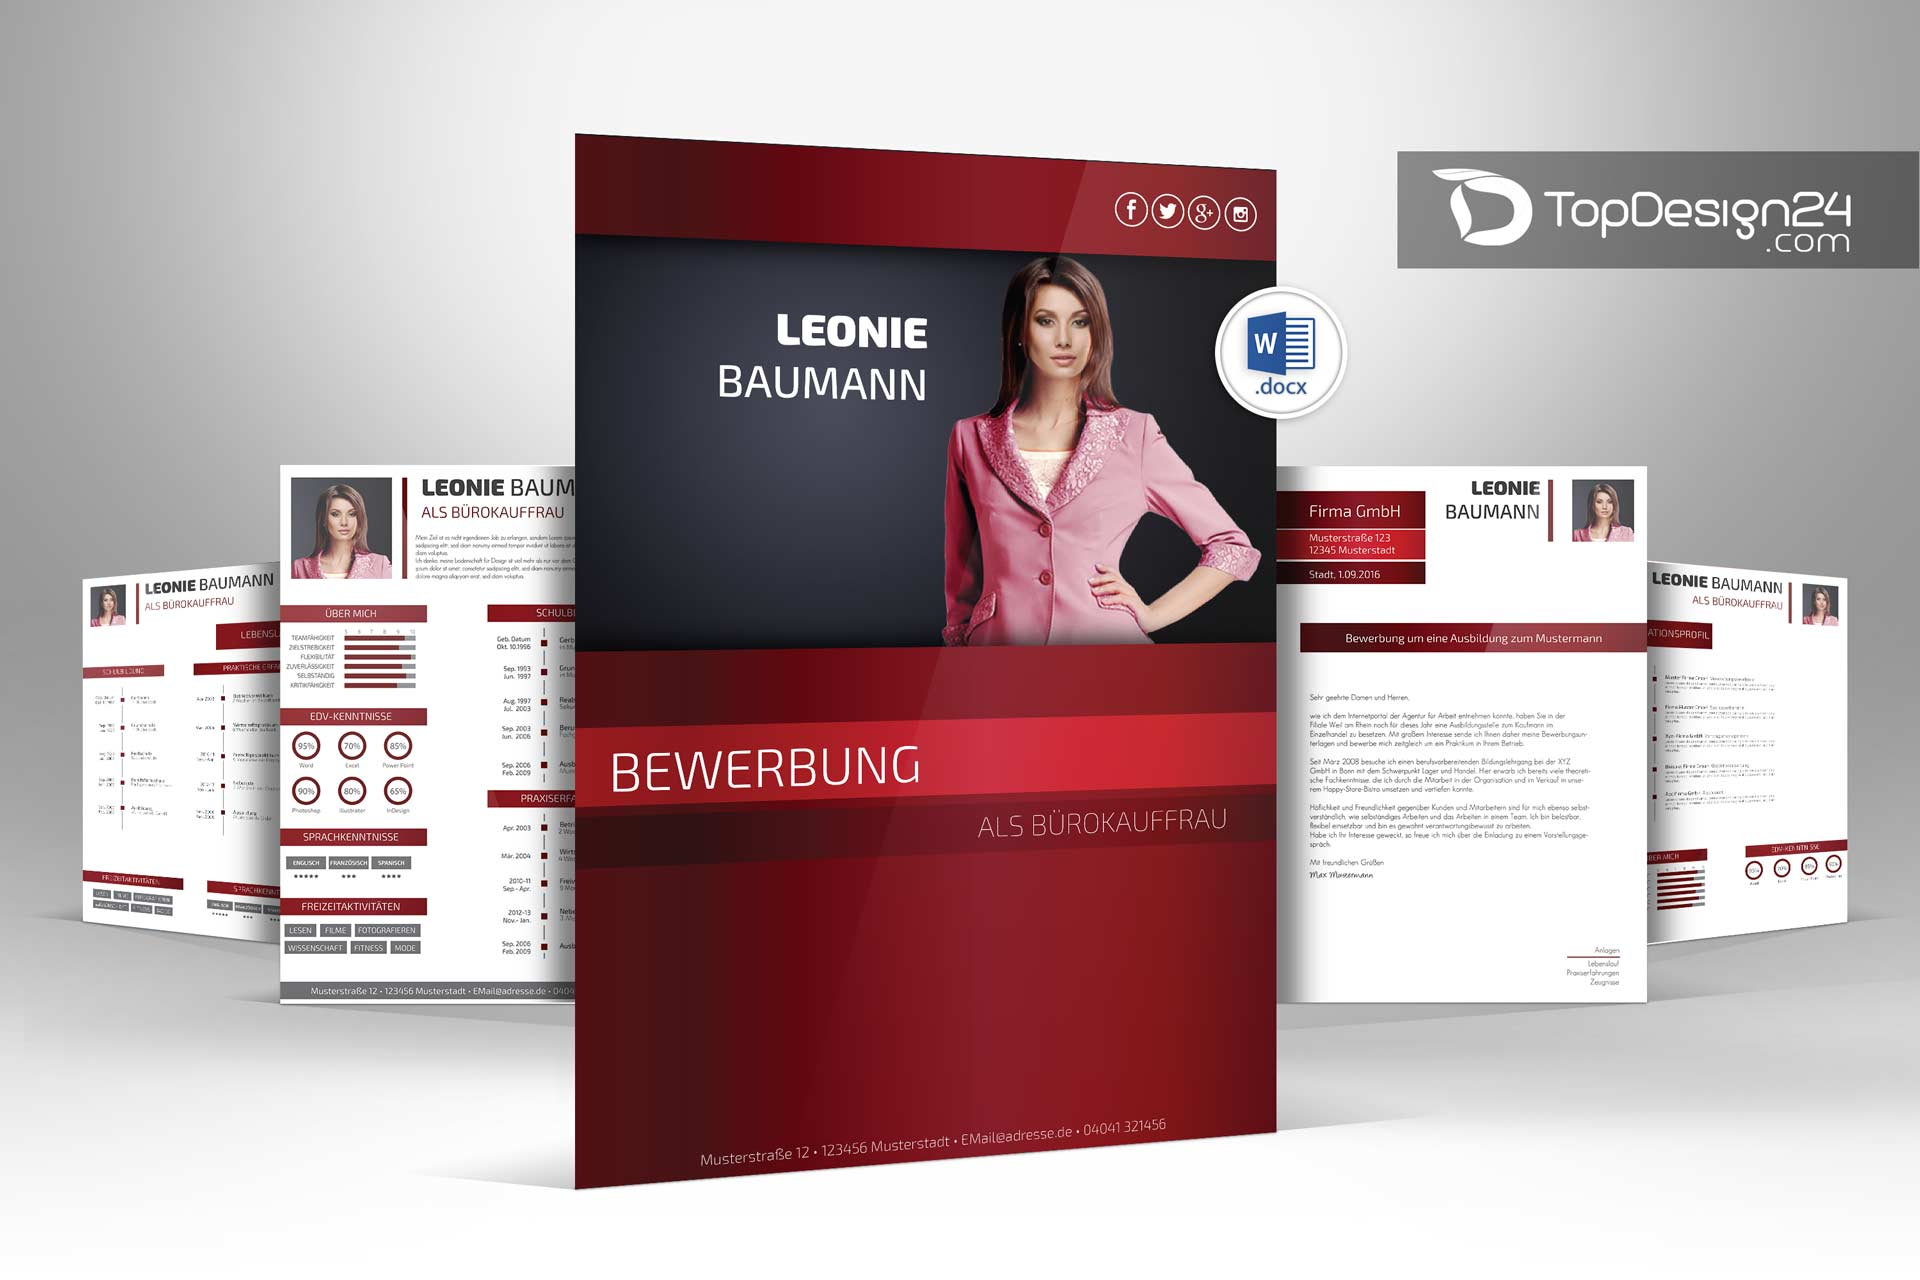 online bewerbung design email - Online Bewerbung Foto